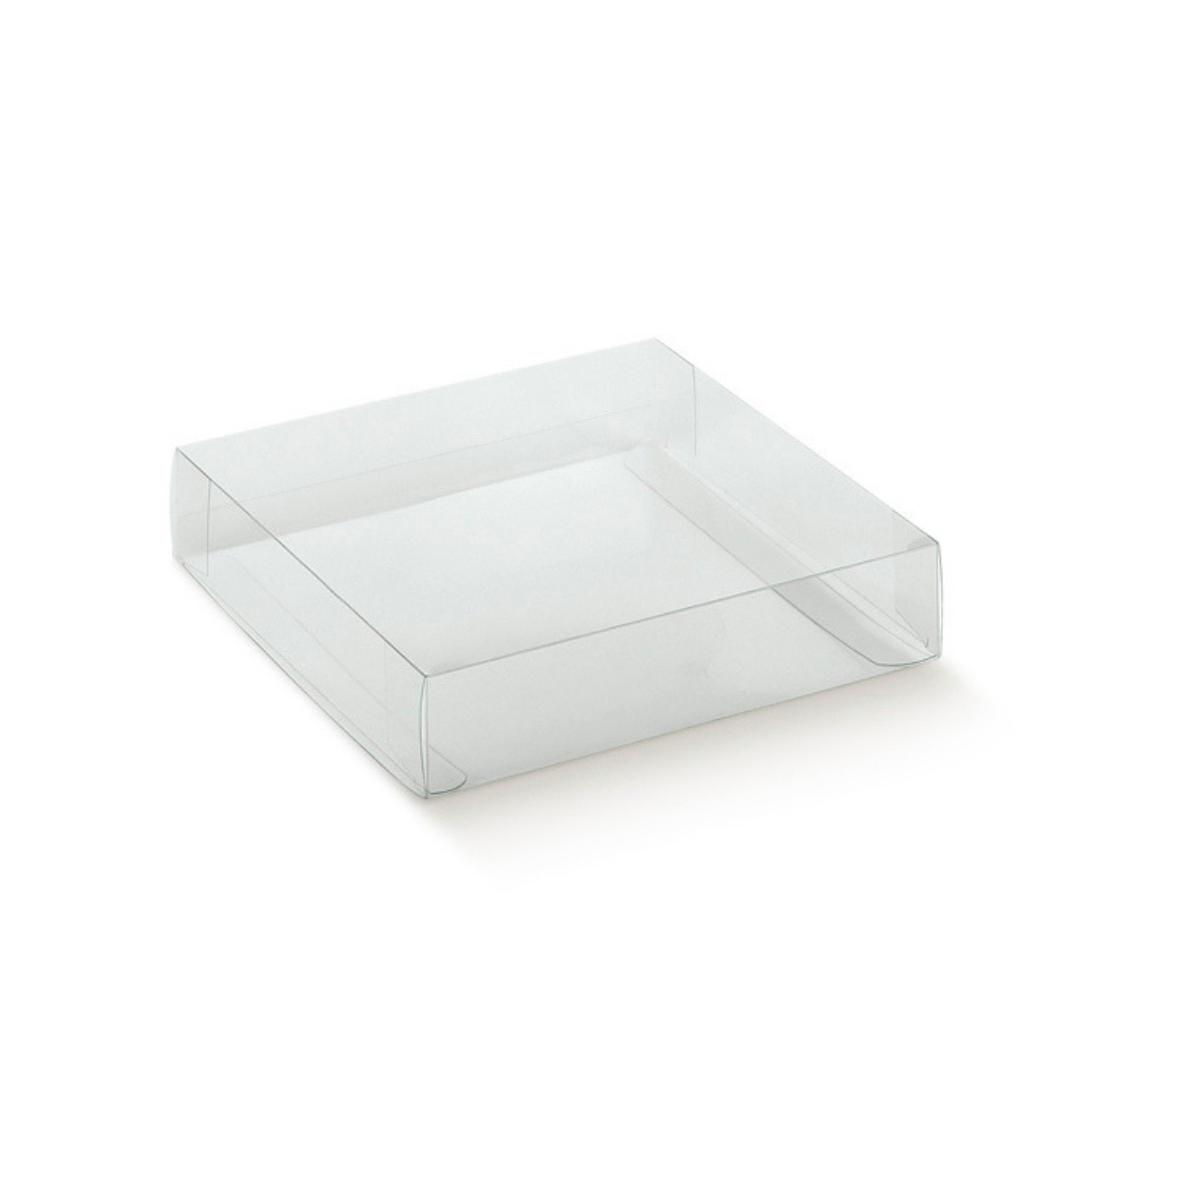 008000278-scatola-trasparente